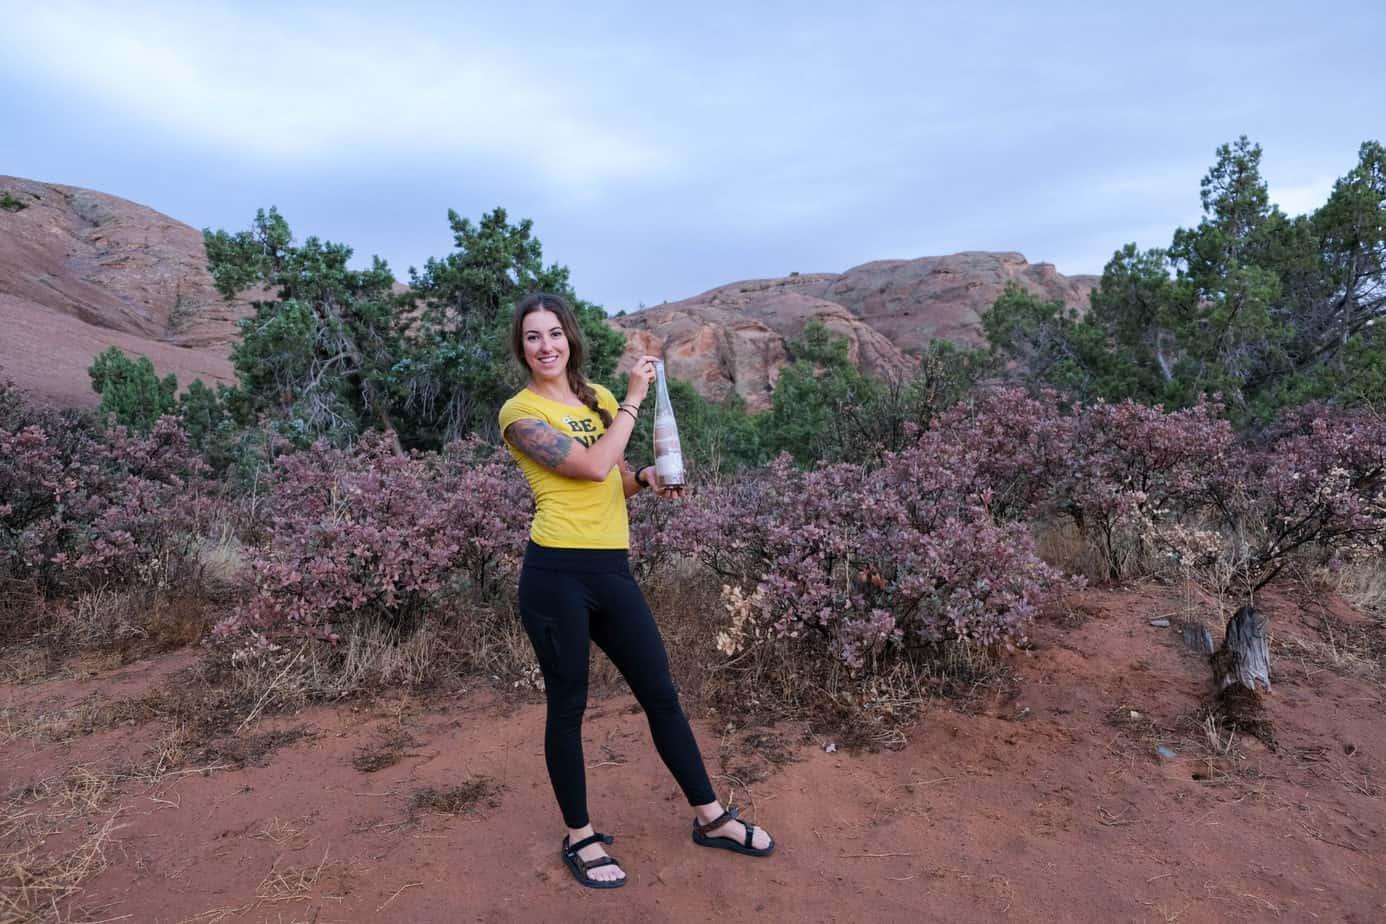 wine bottle craft in desert